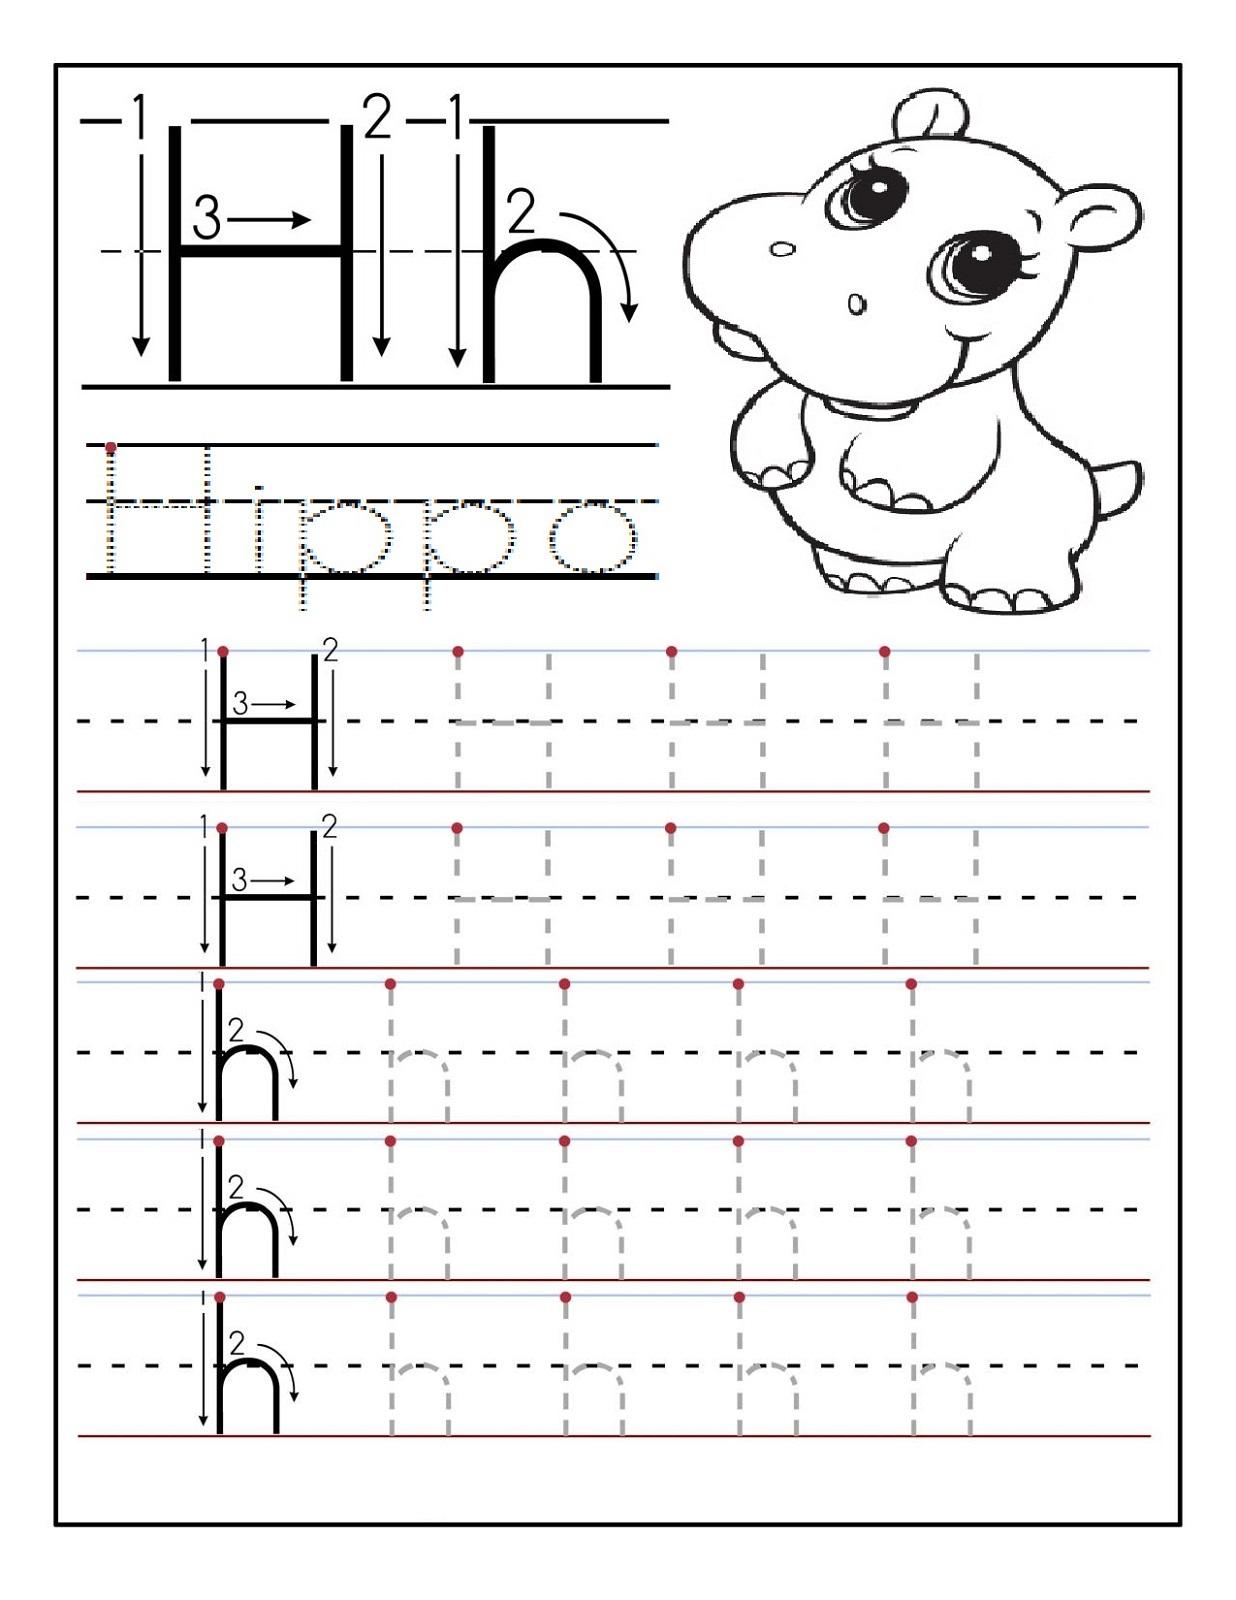 preschool alphabet worksheets 5